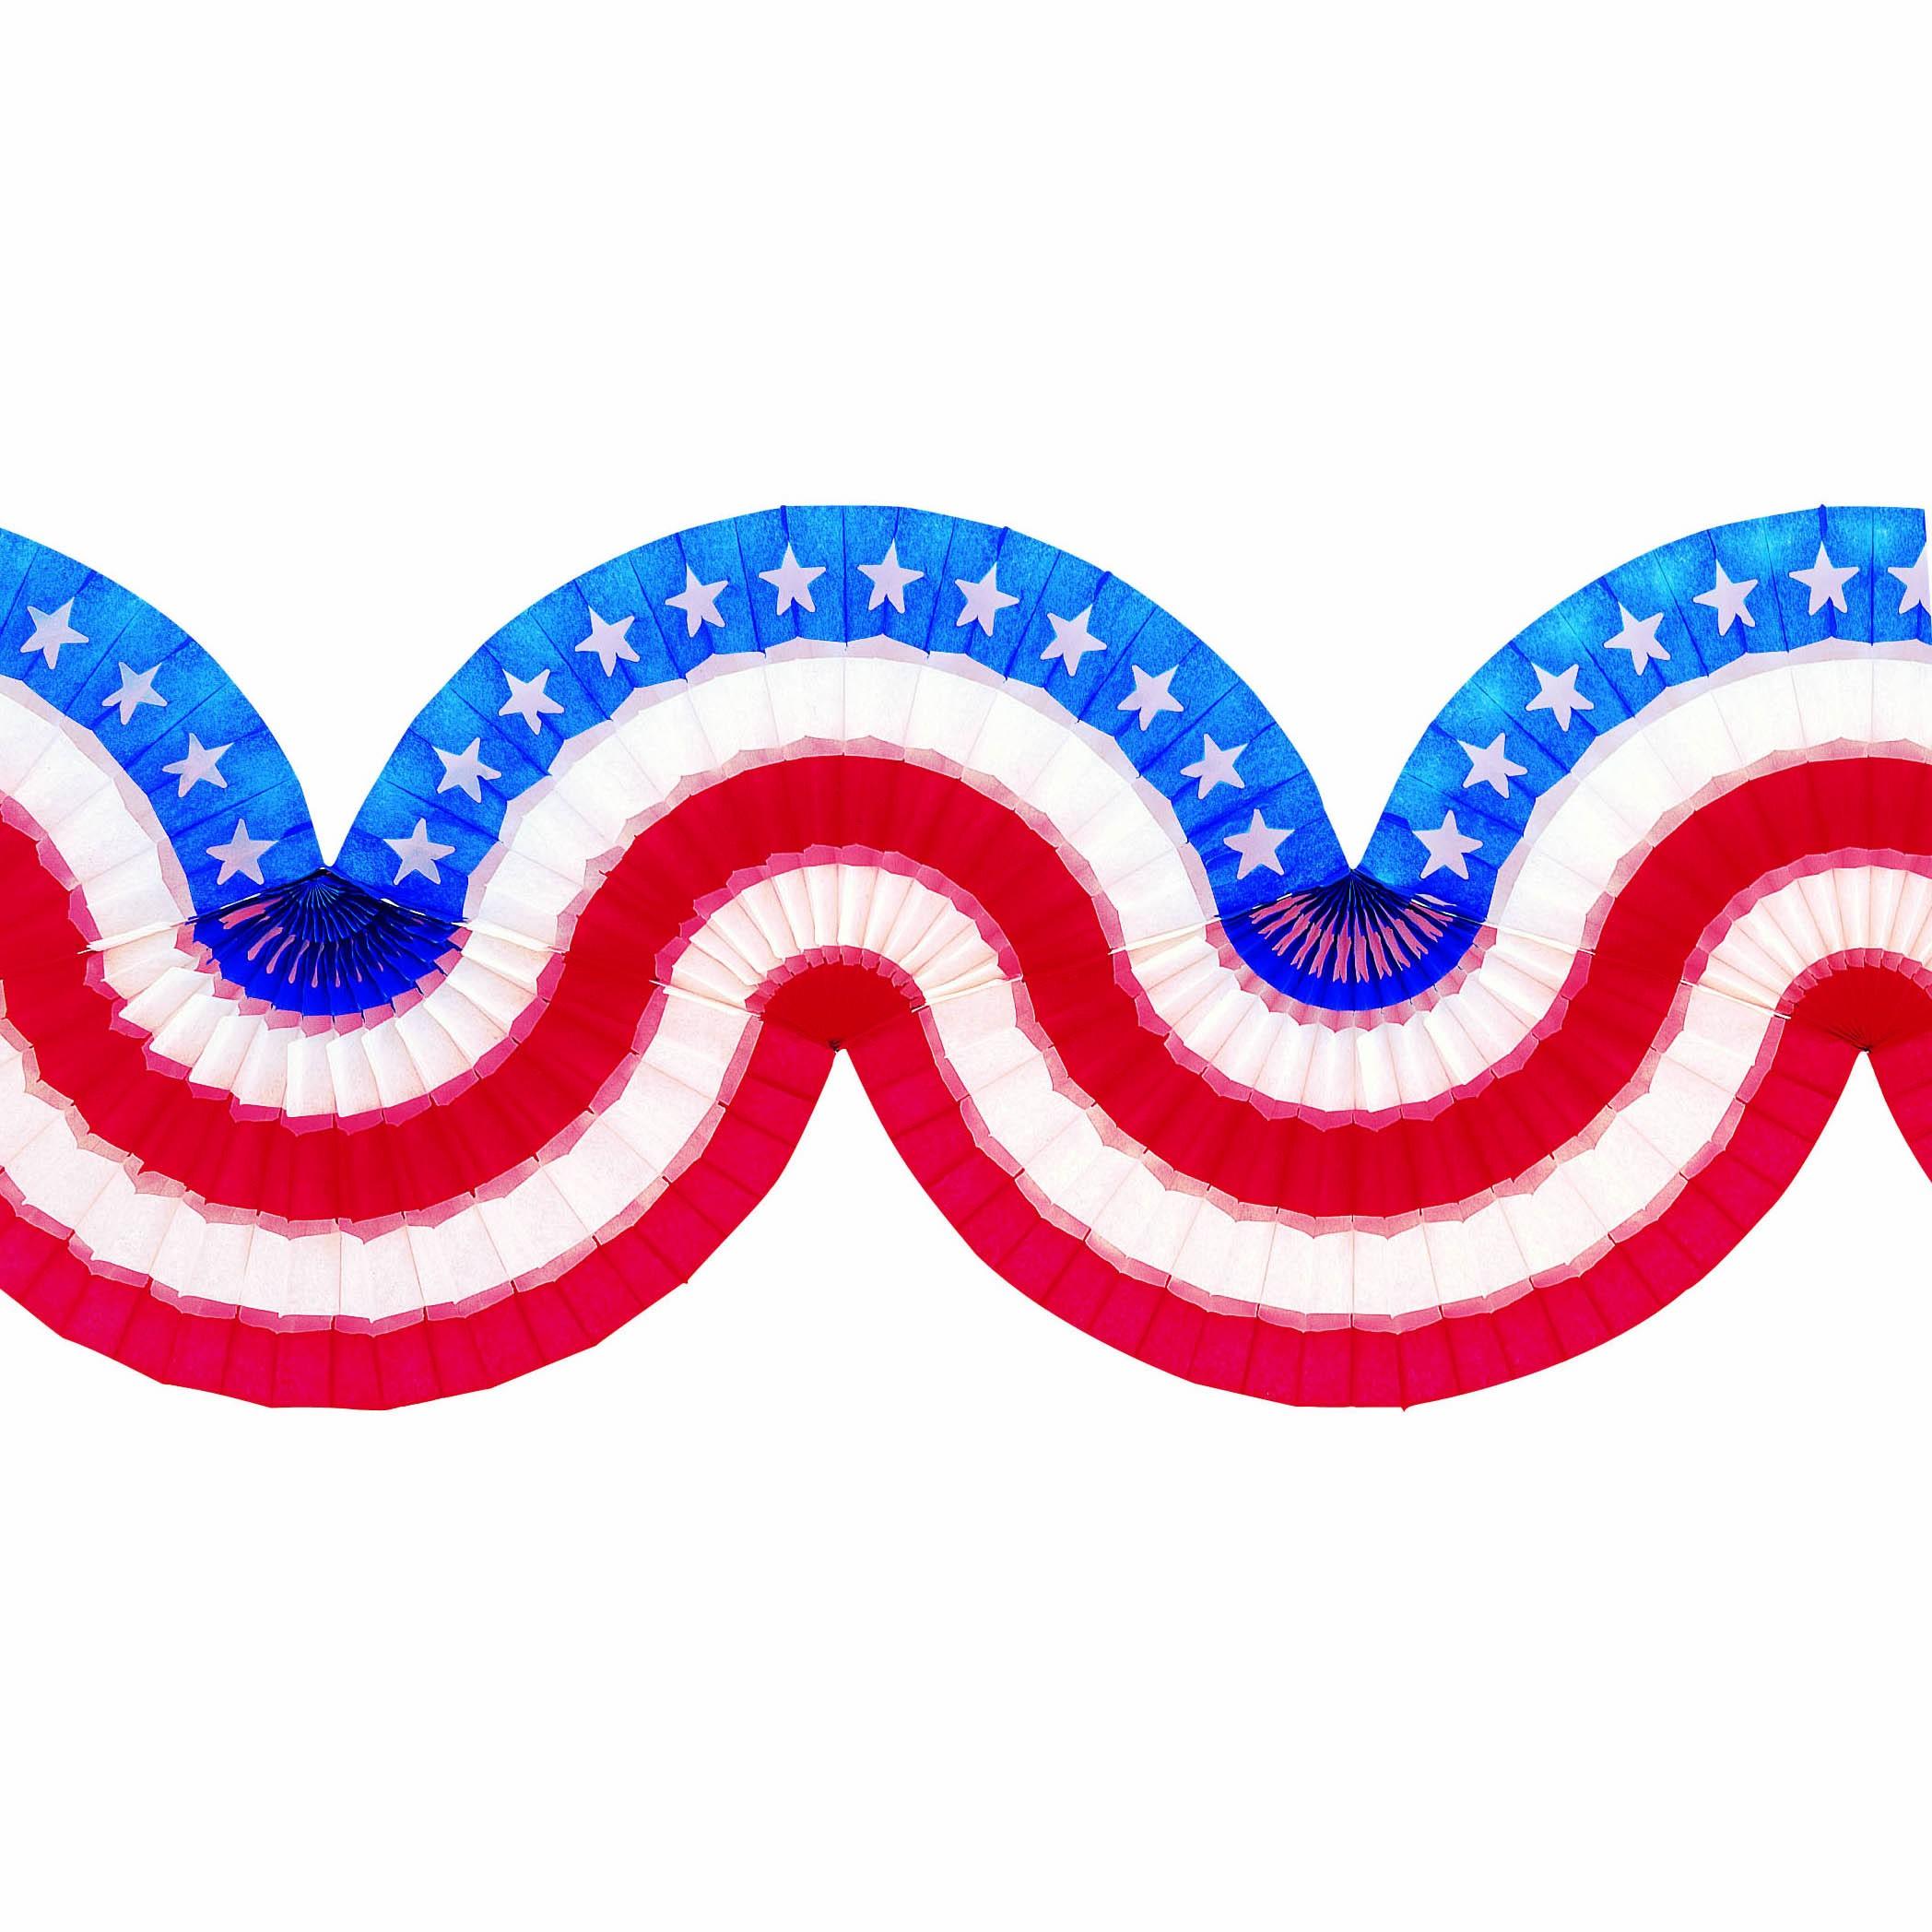 2096x2096 Free Patriotic Clipart Free American Art Clipartix 3